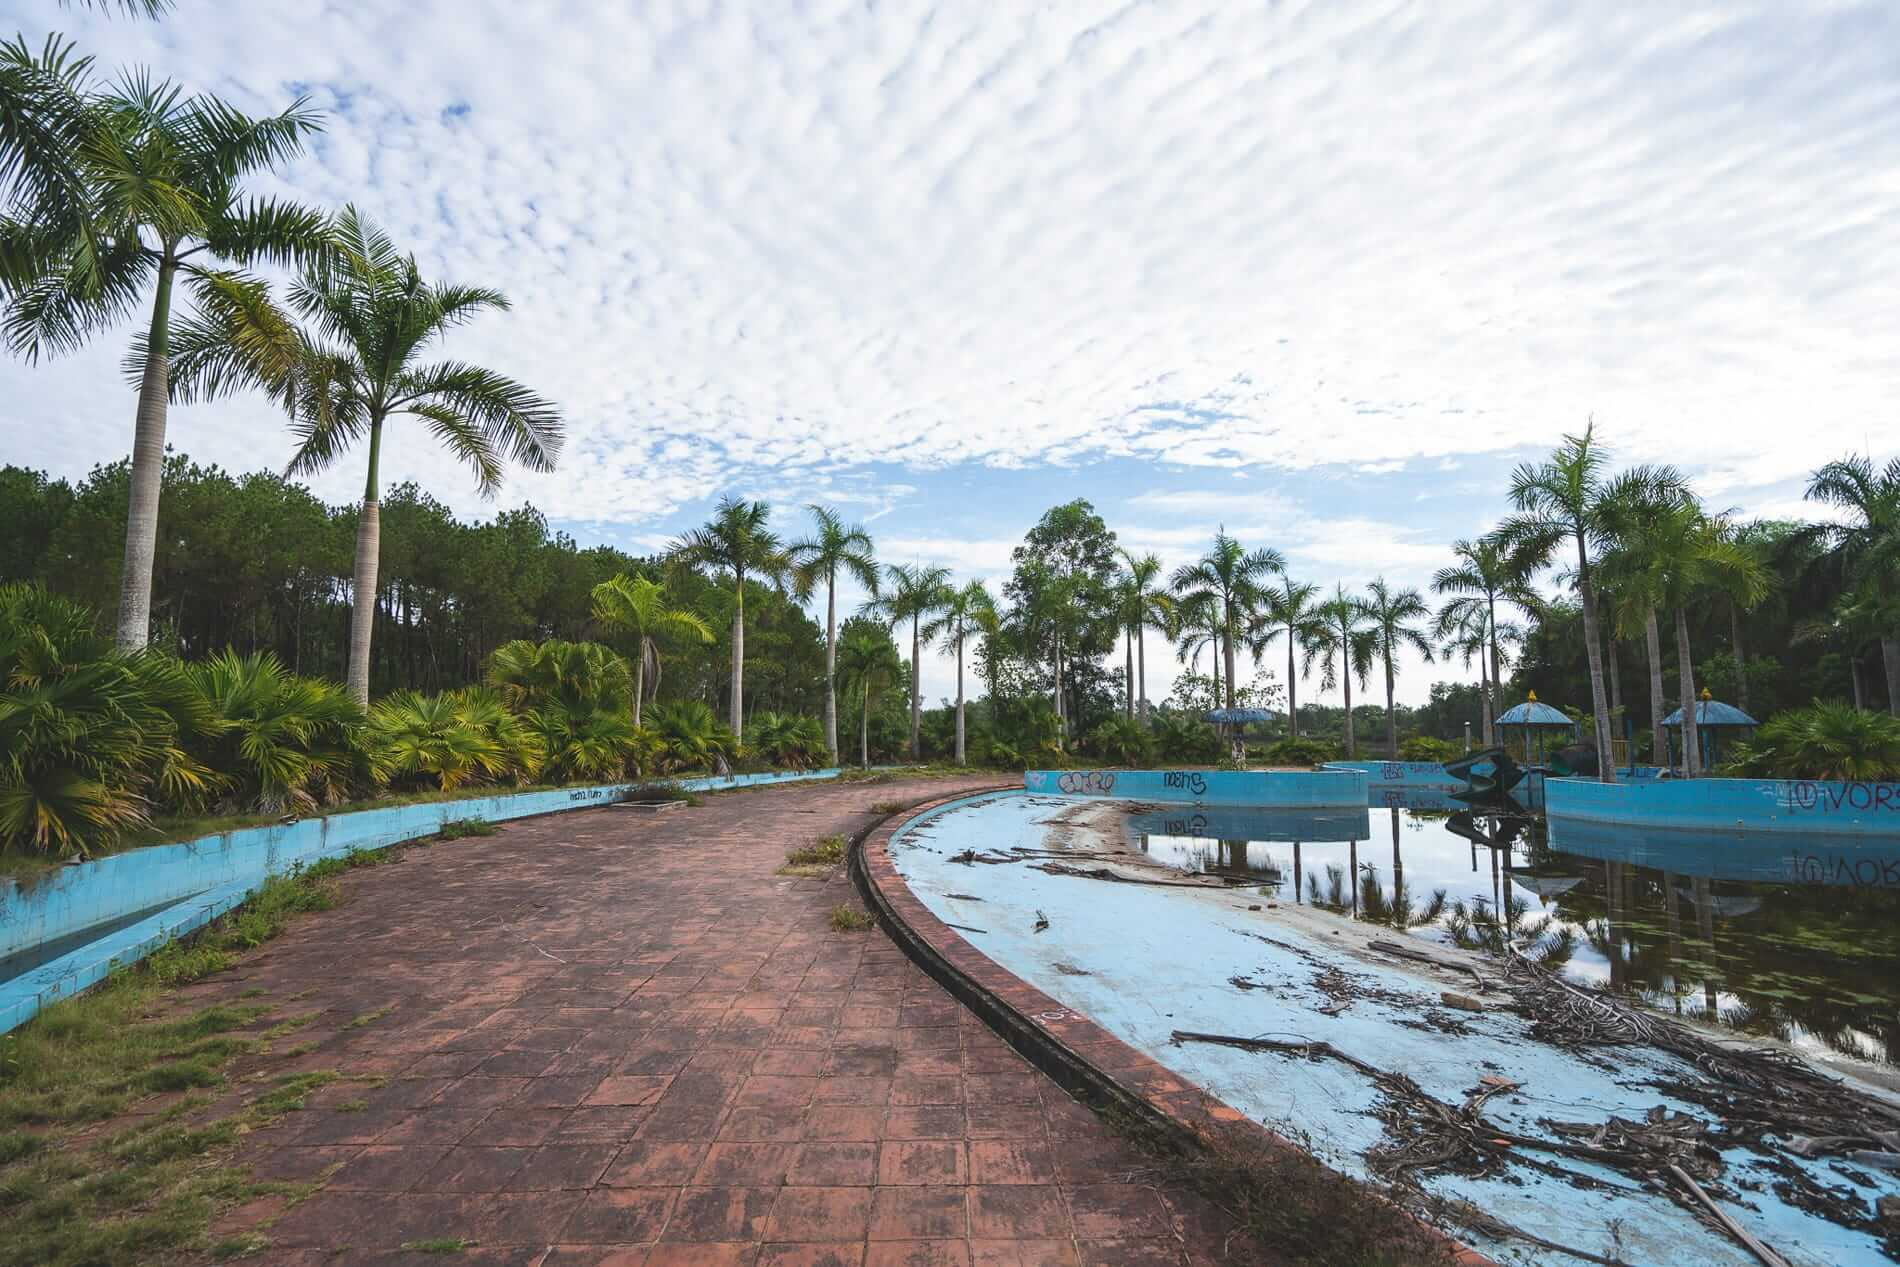 Dirty park - Hues Abandoned Water Park